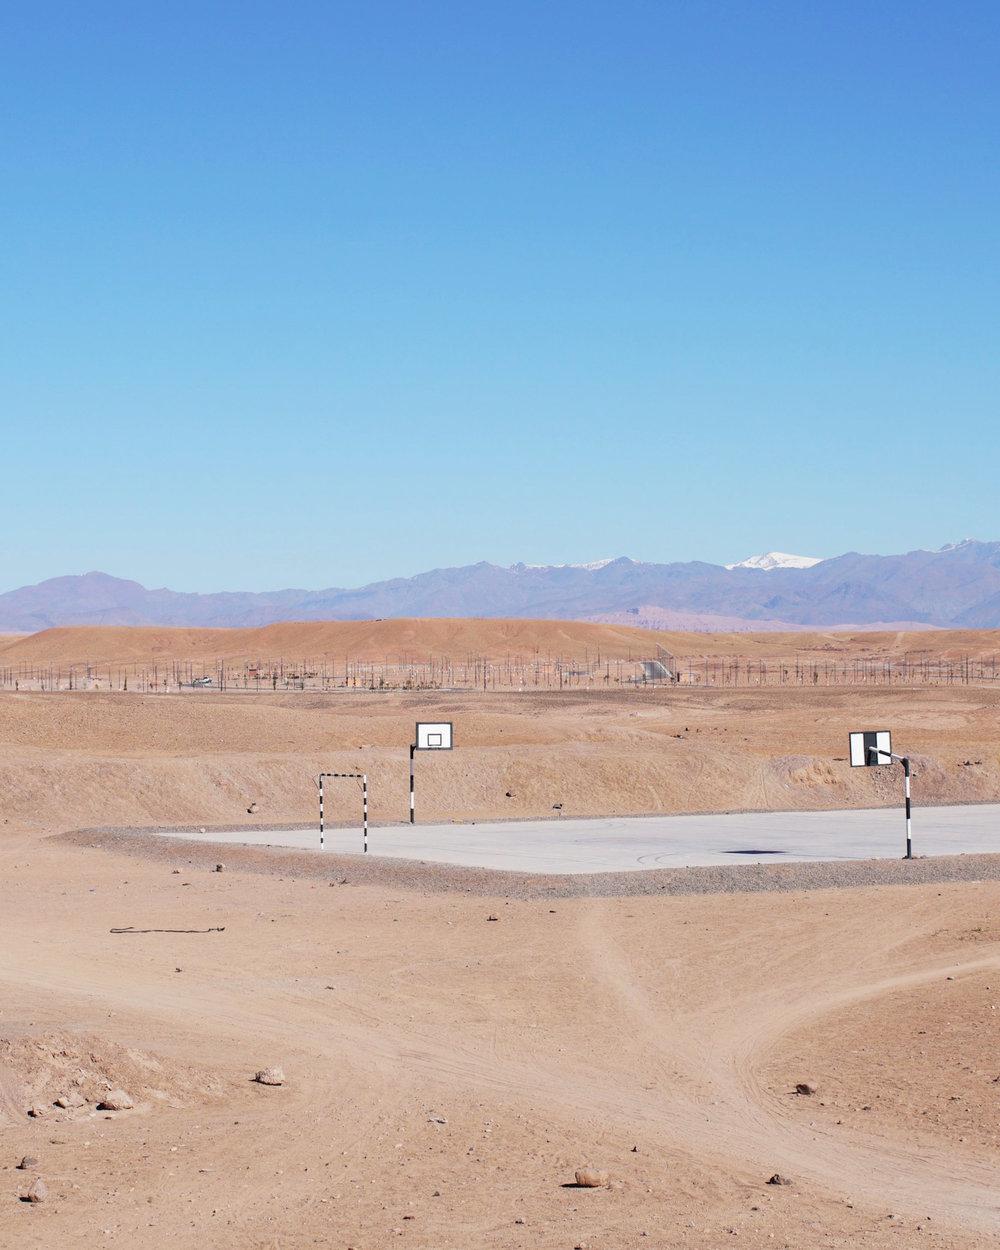 Morocco field trip